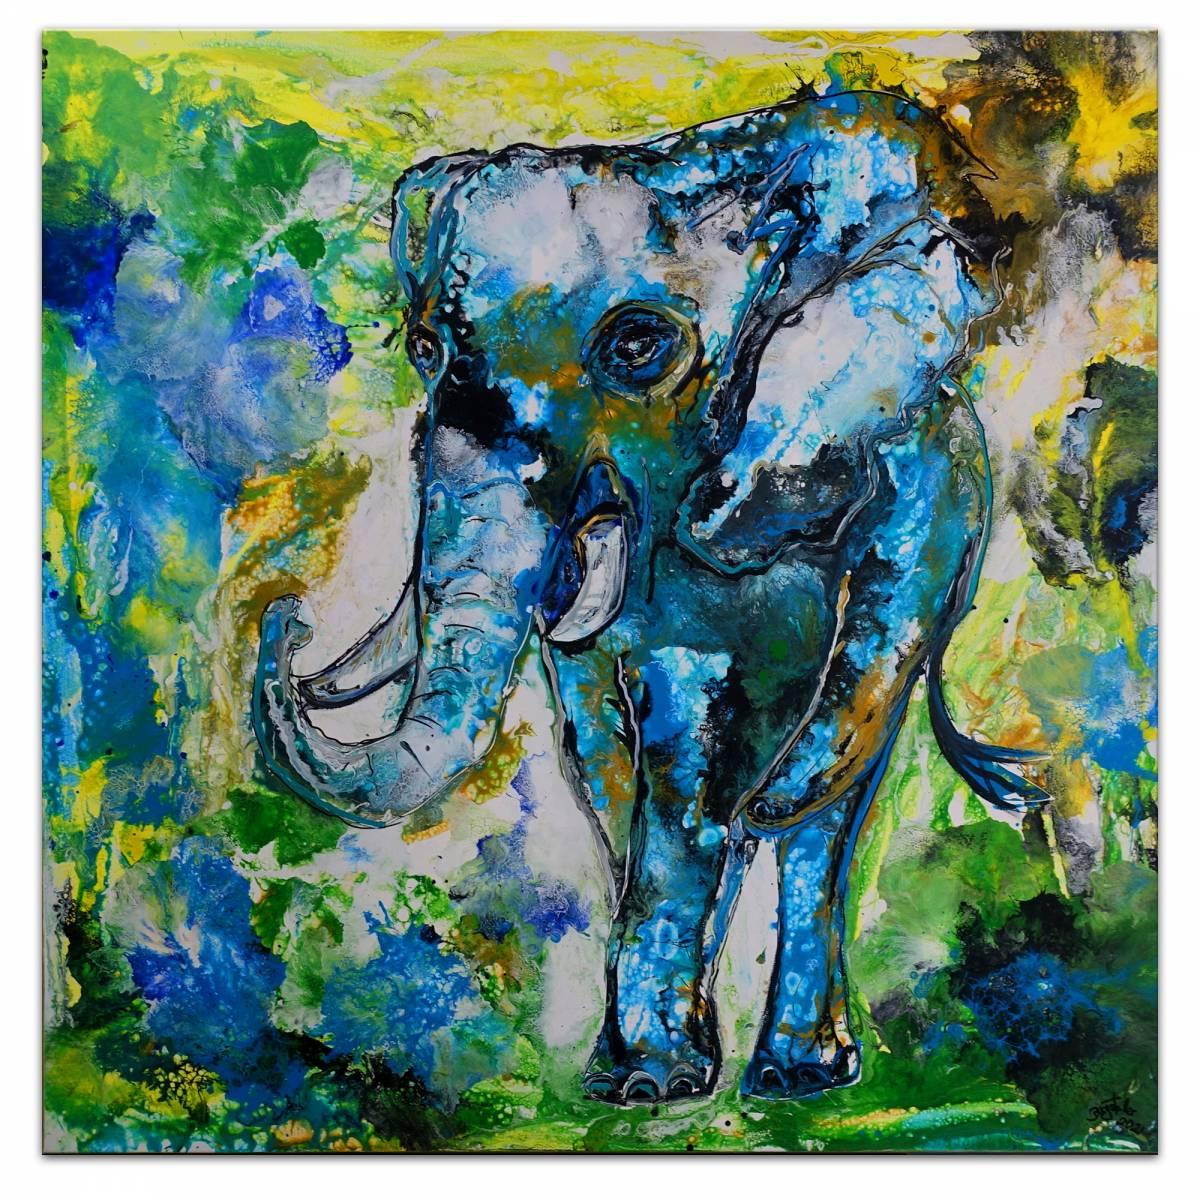 'Elefanten Wandbild Tiermalerei -  Modernes Kunstbild -  Leinwandbild' von Burgstallers Art Gemaelde